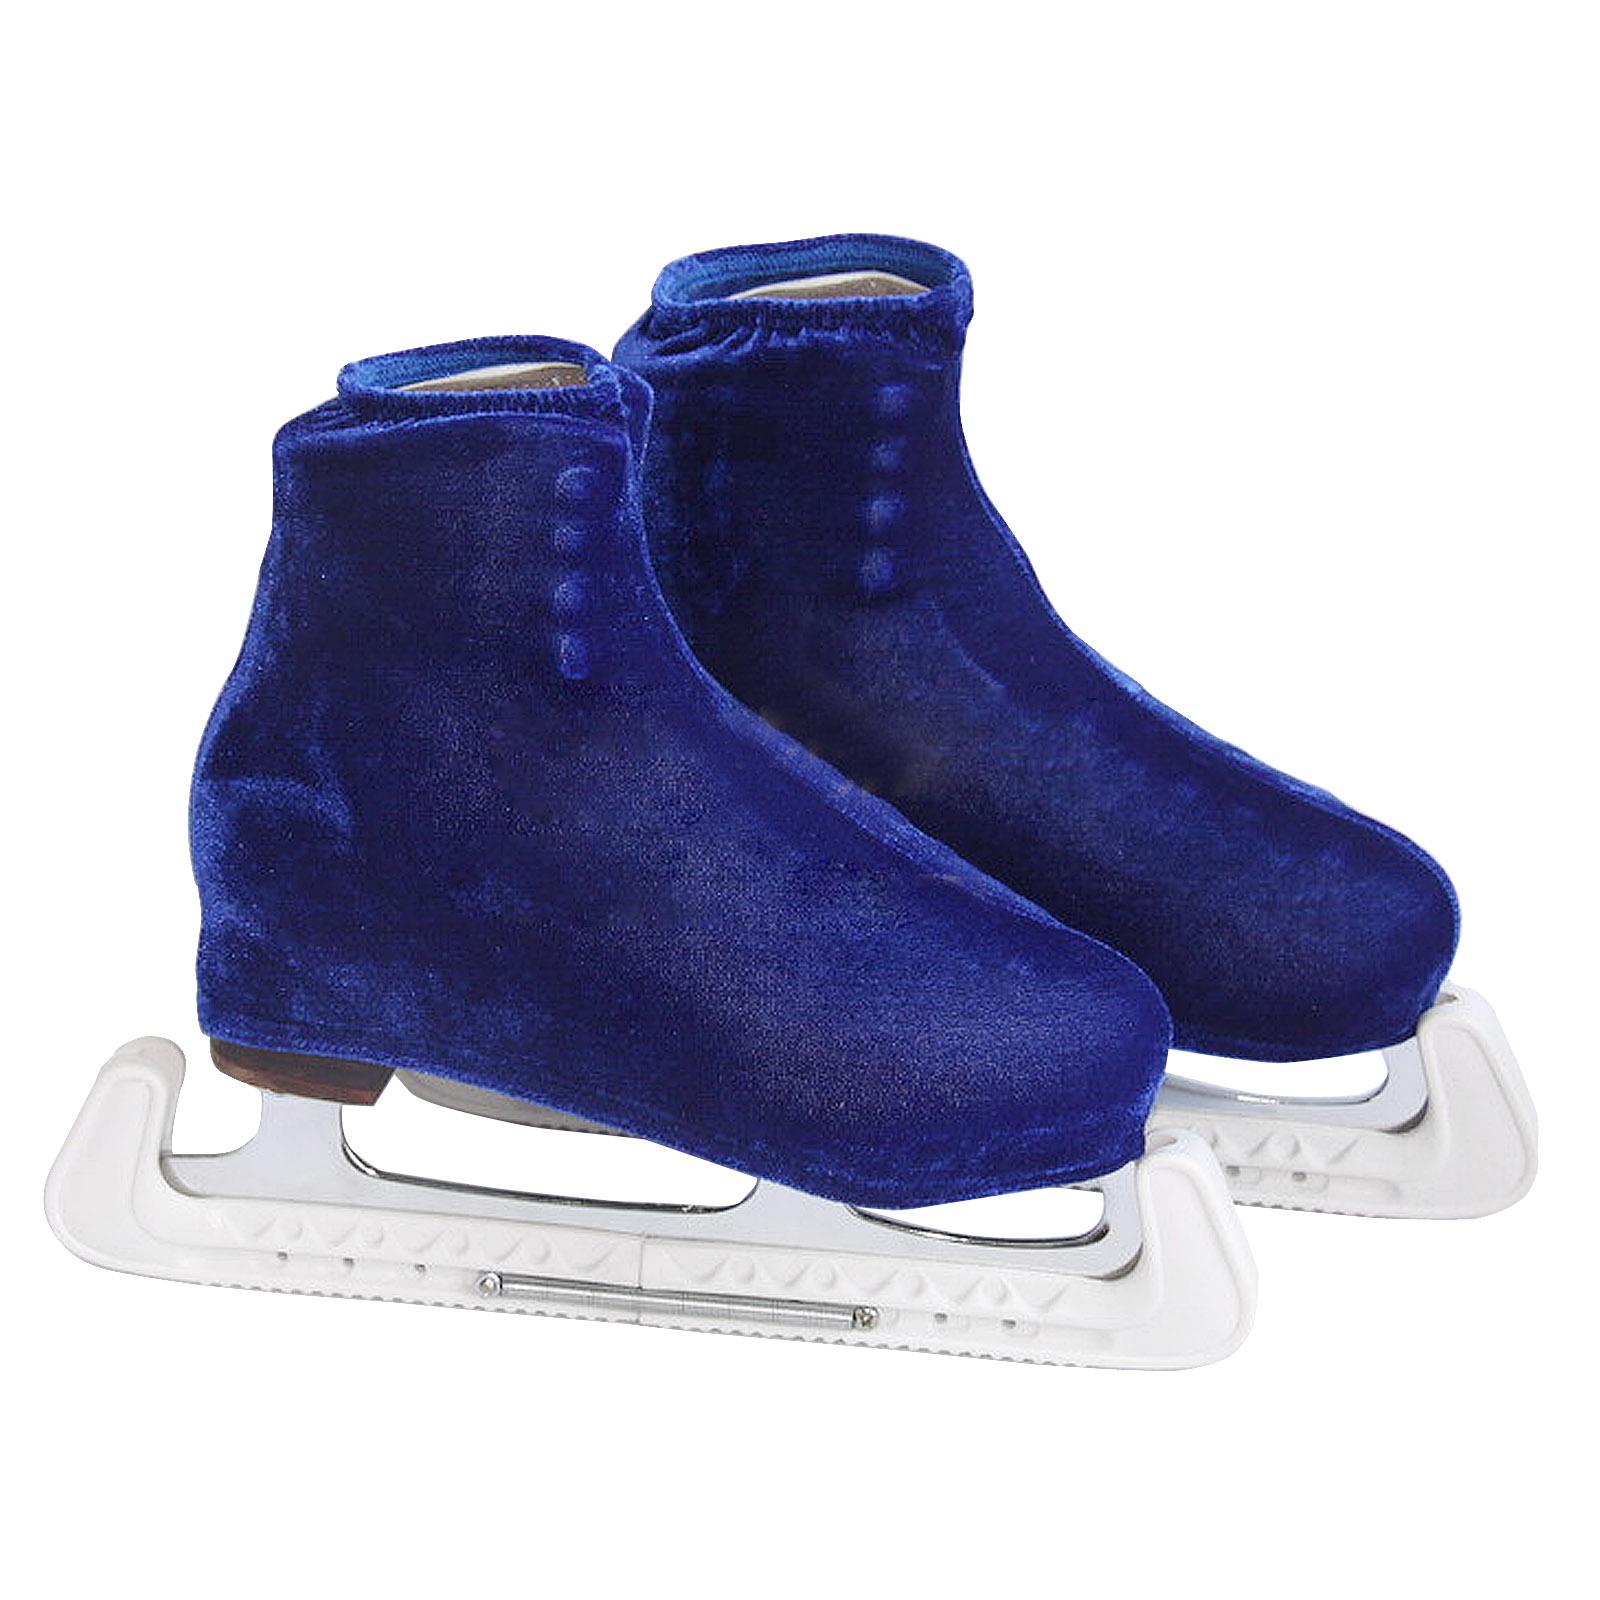 Pair Adjustable Ice Hockey Figure Skate Walking Blade Guard Protector Custom Fit